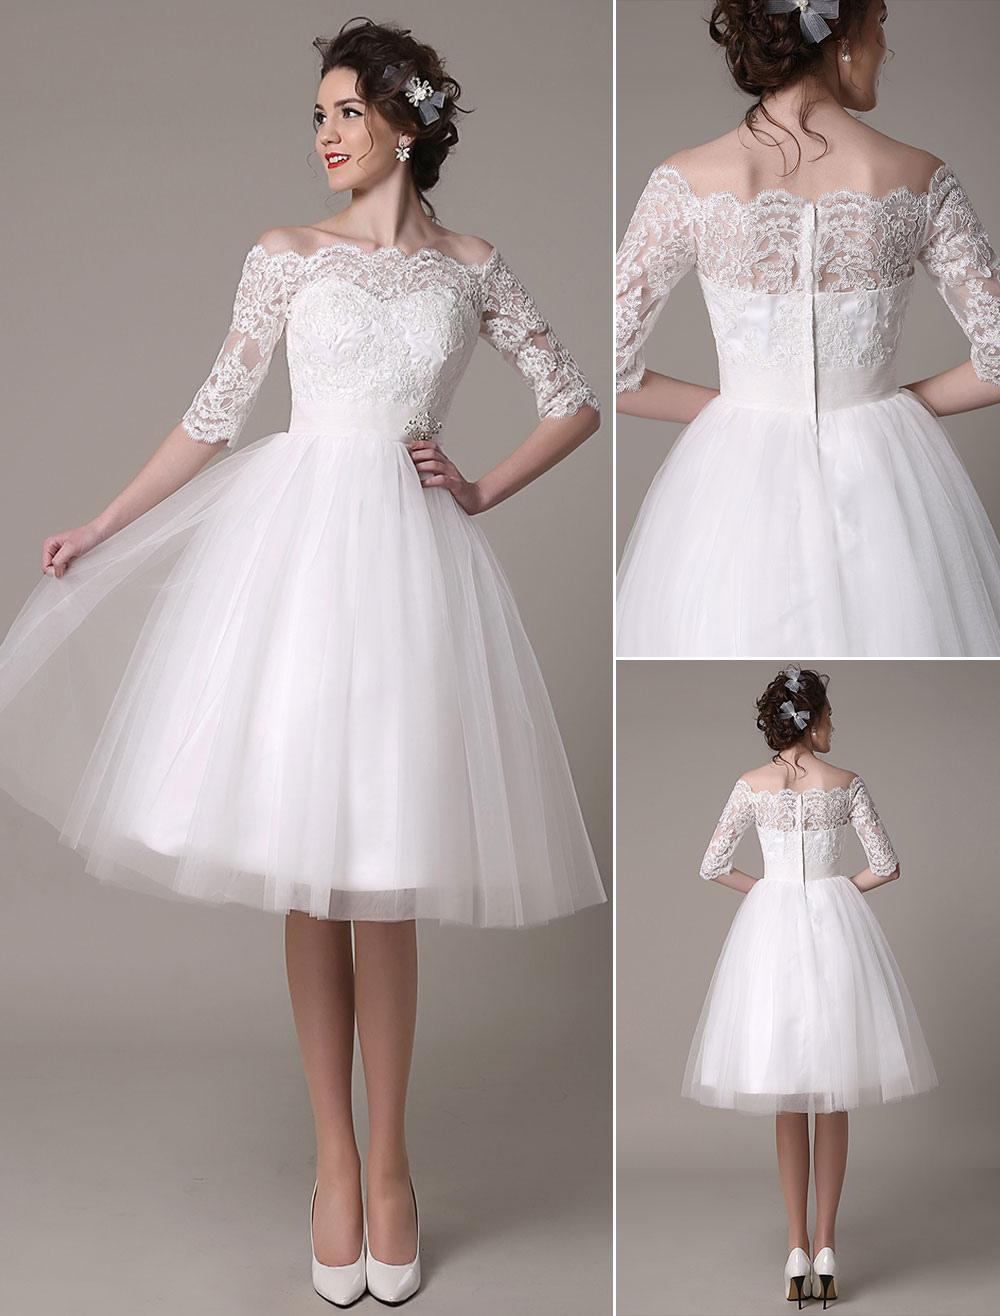 lace wedding dress a line knee length waist rhinestone. Black Bedroom Furniture Sets. Home Design Ideas